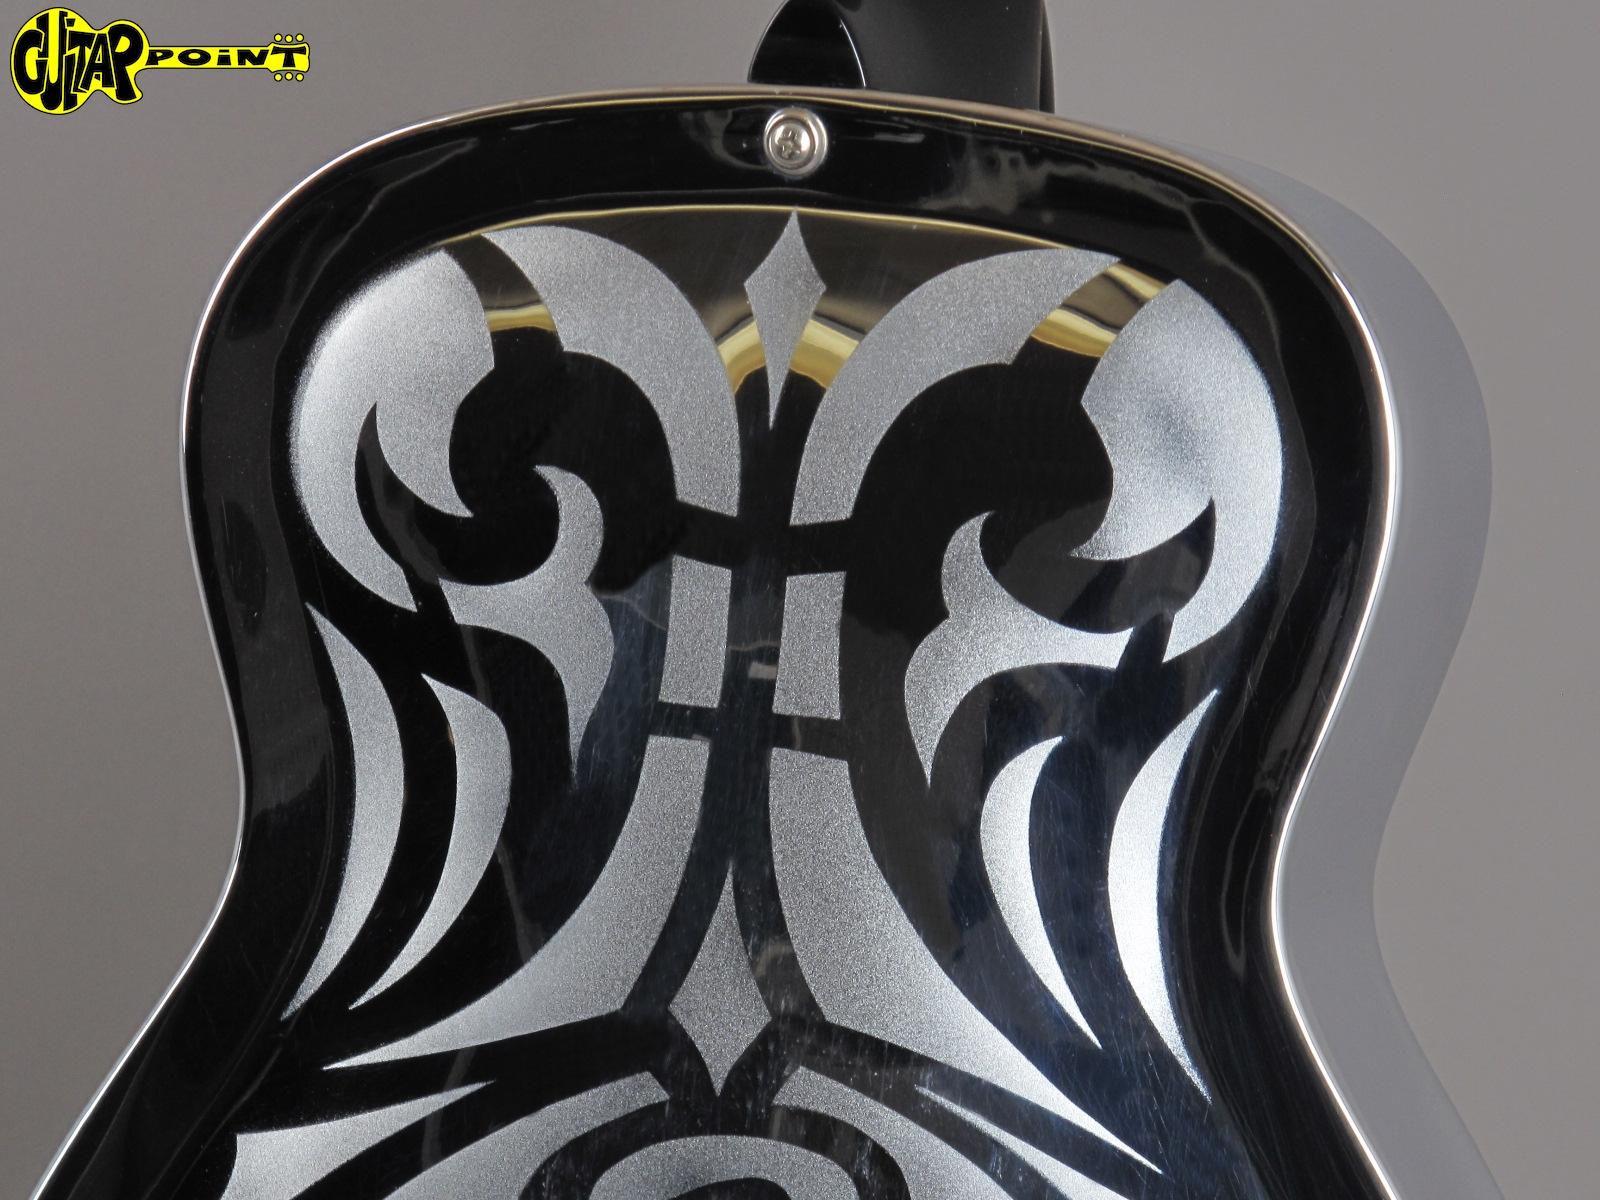 https://guitarpoint.de/app/uploads/products/1978-dobro-model-33d-round-neck-metal-body-swirl-motives/Dobro78Model33D_8.jpg